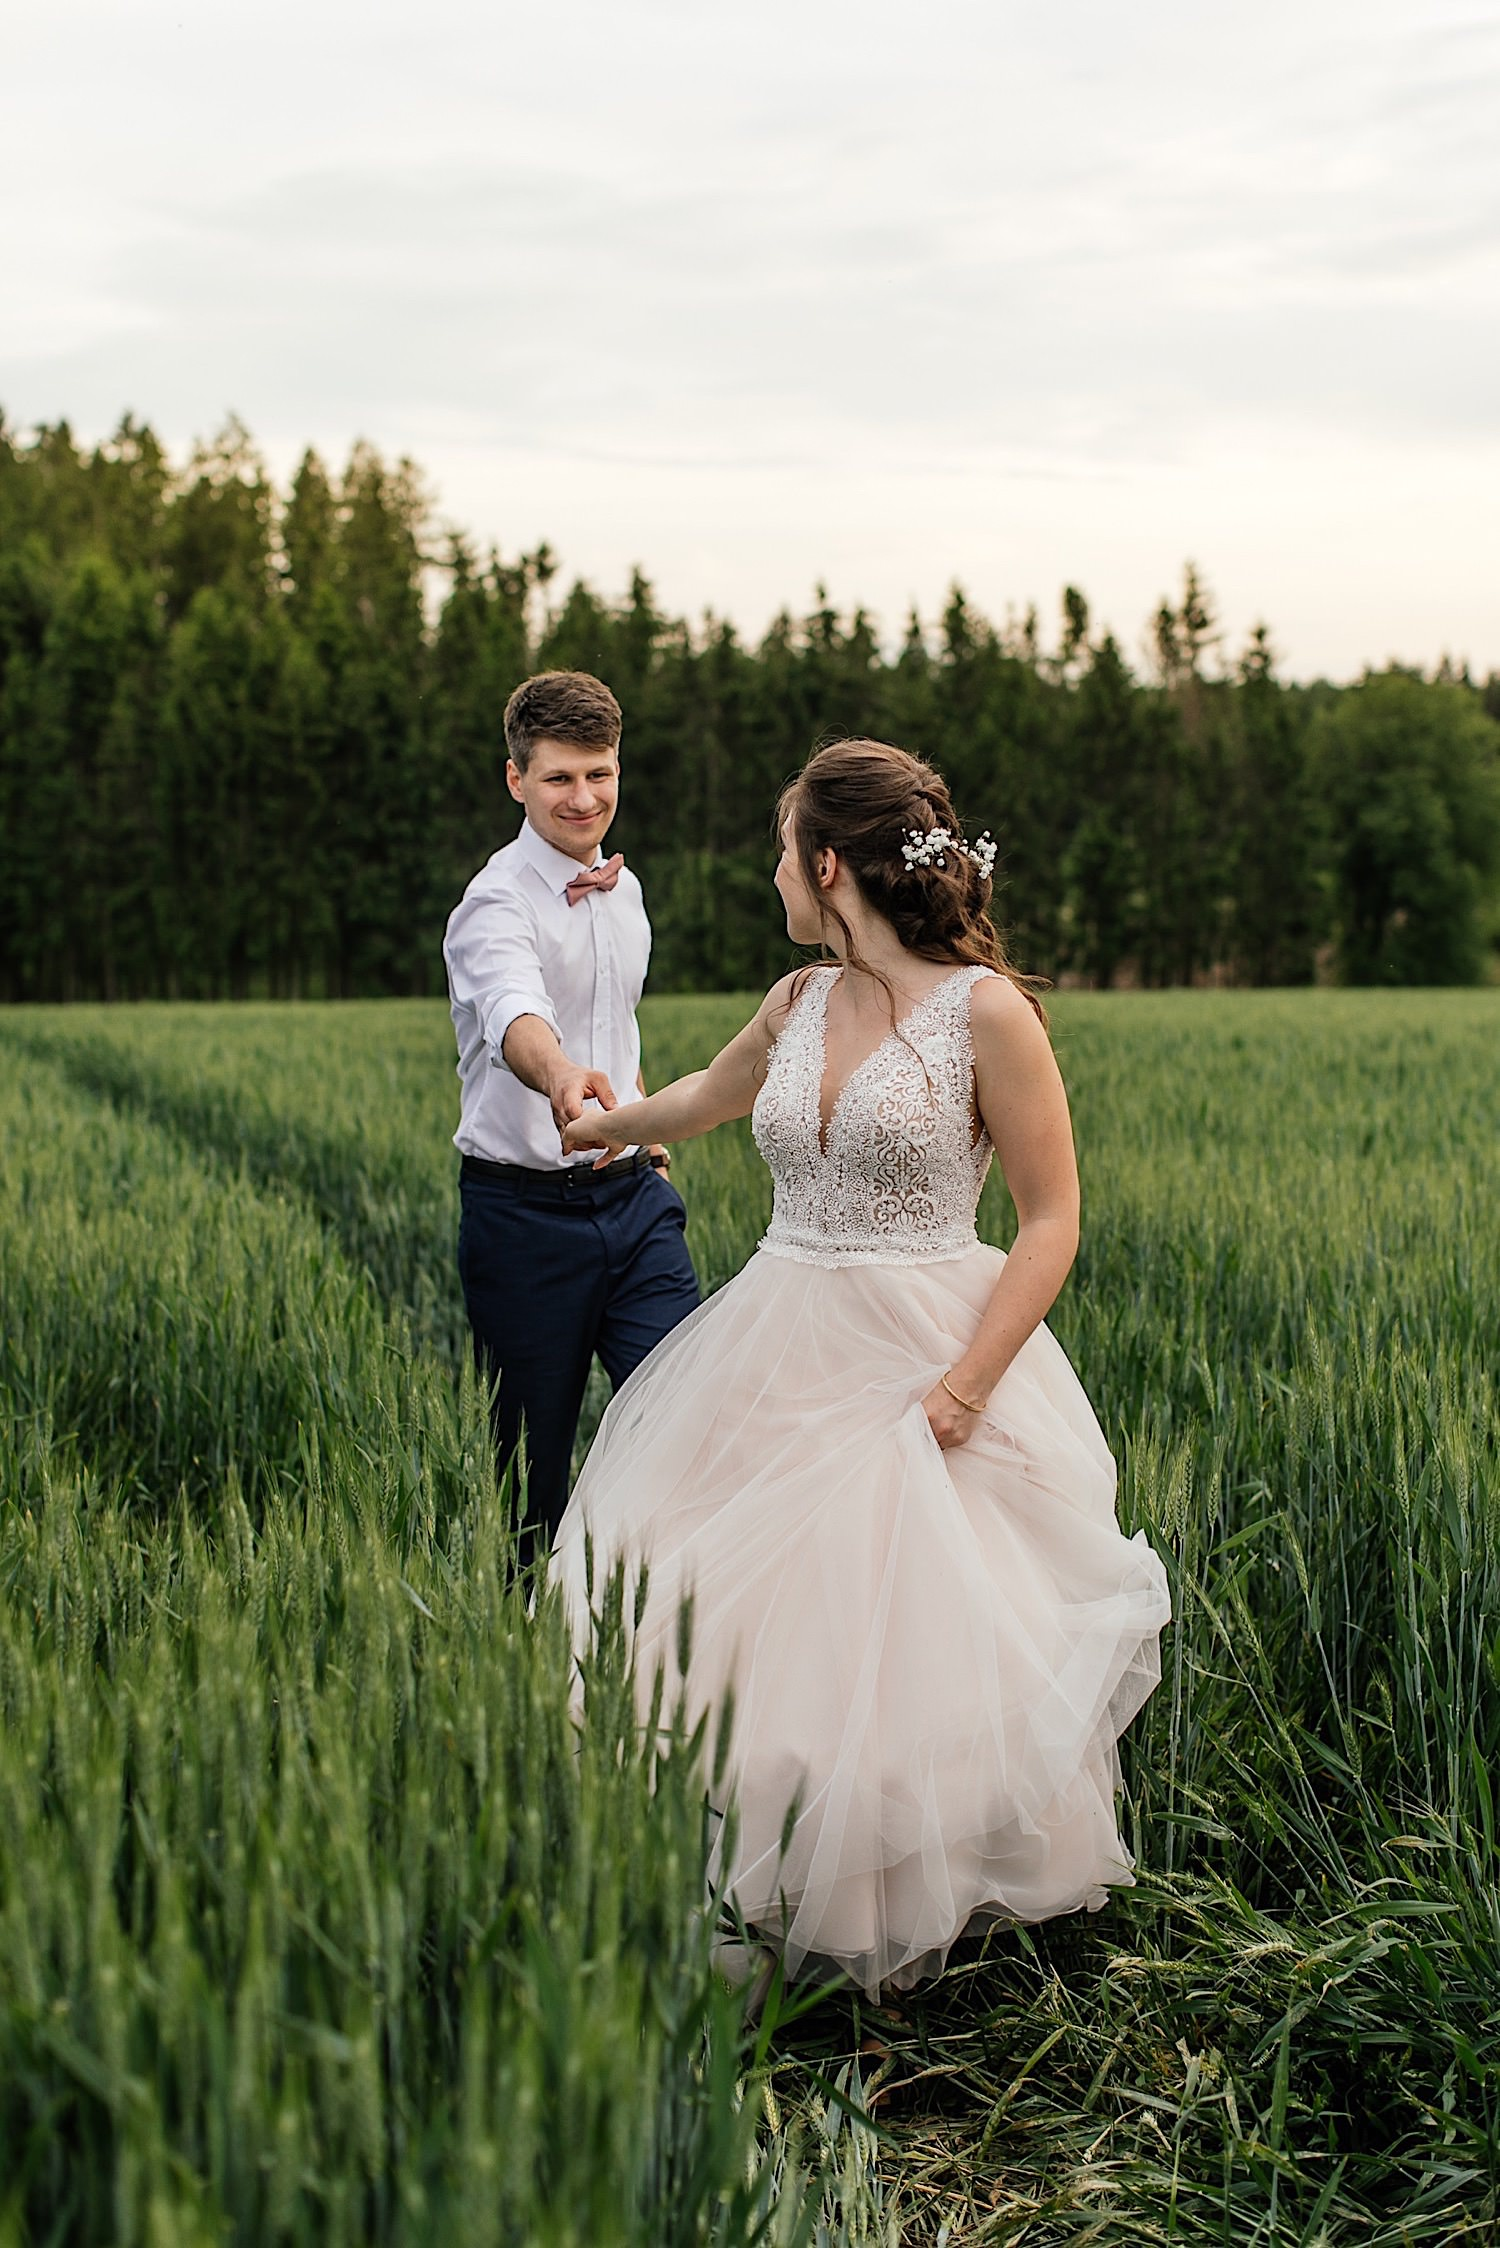 After Wedding Shooting Hochzeitsfotograf Augsburg